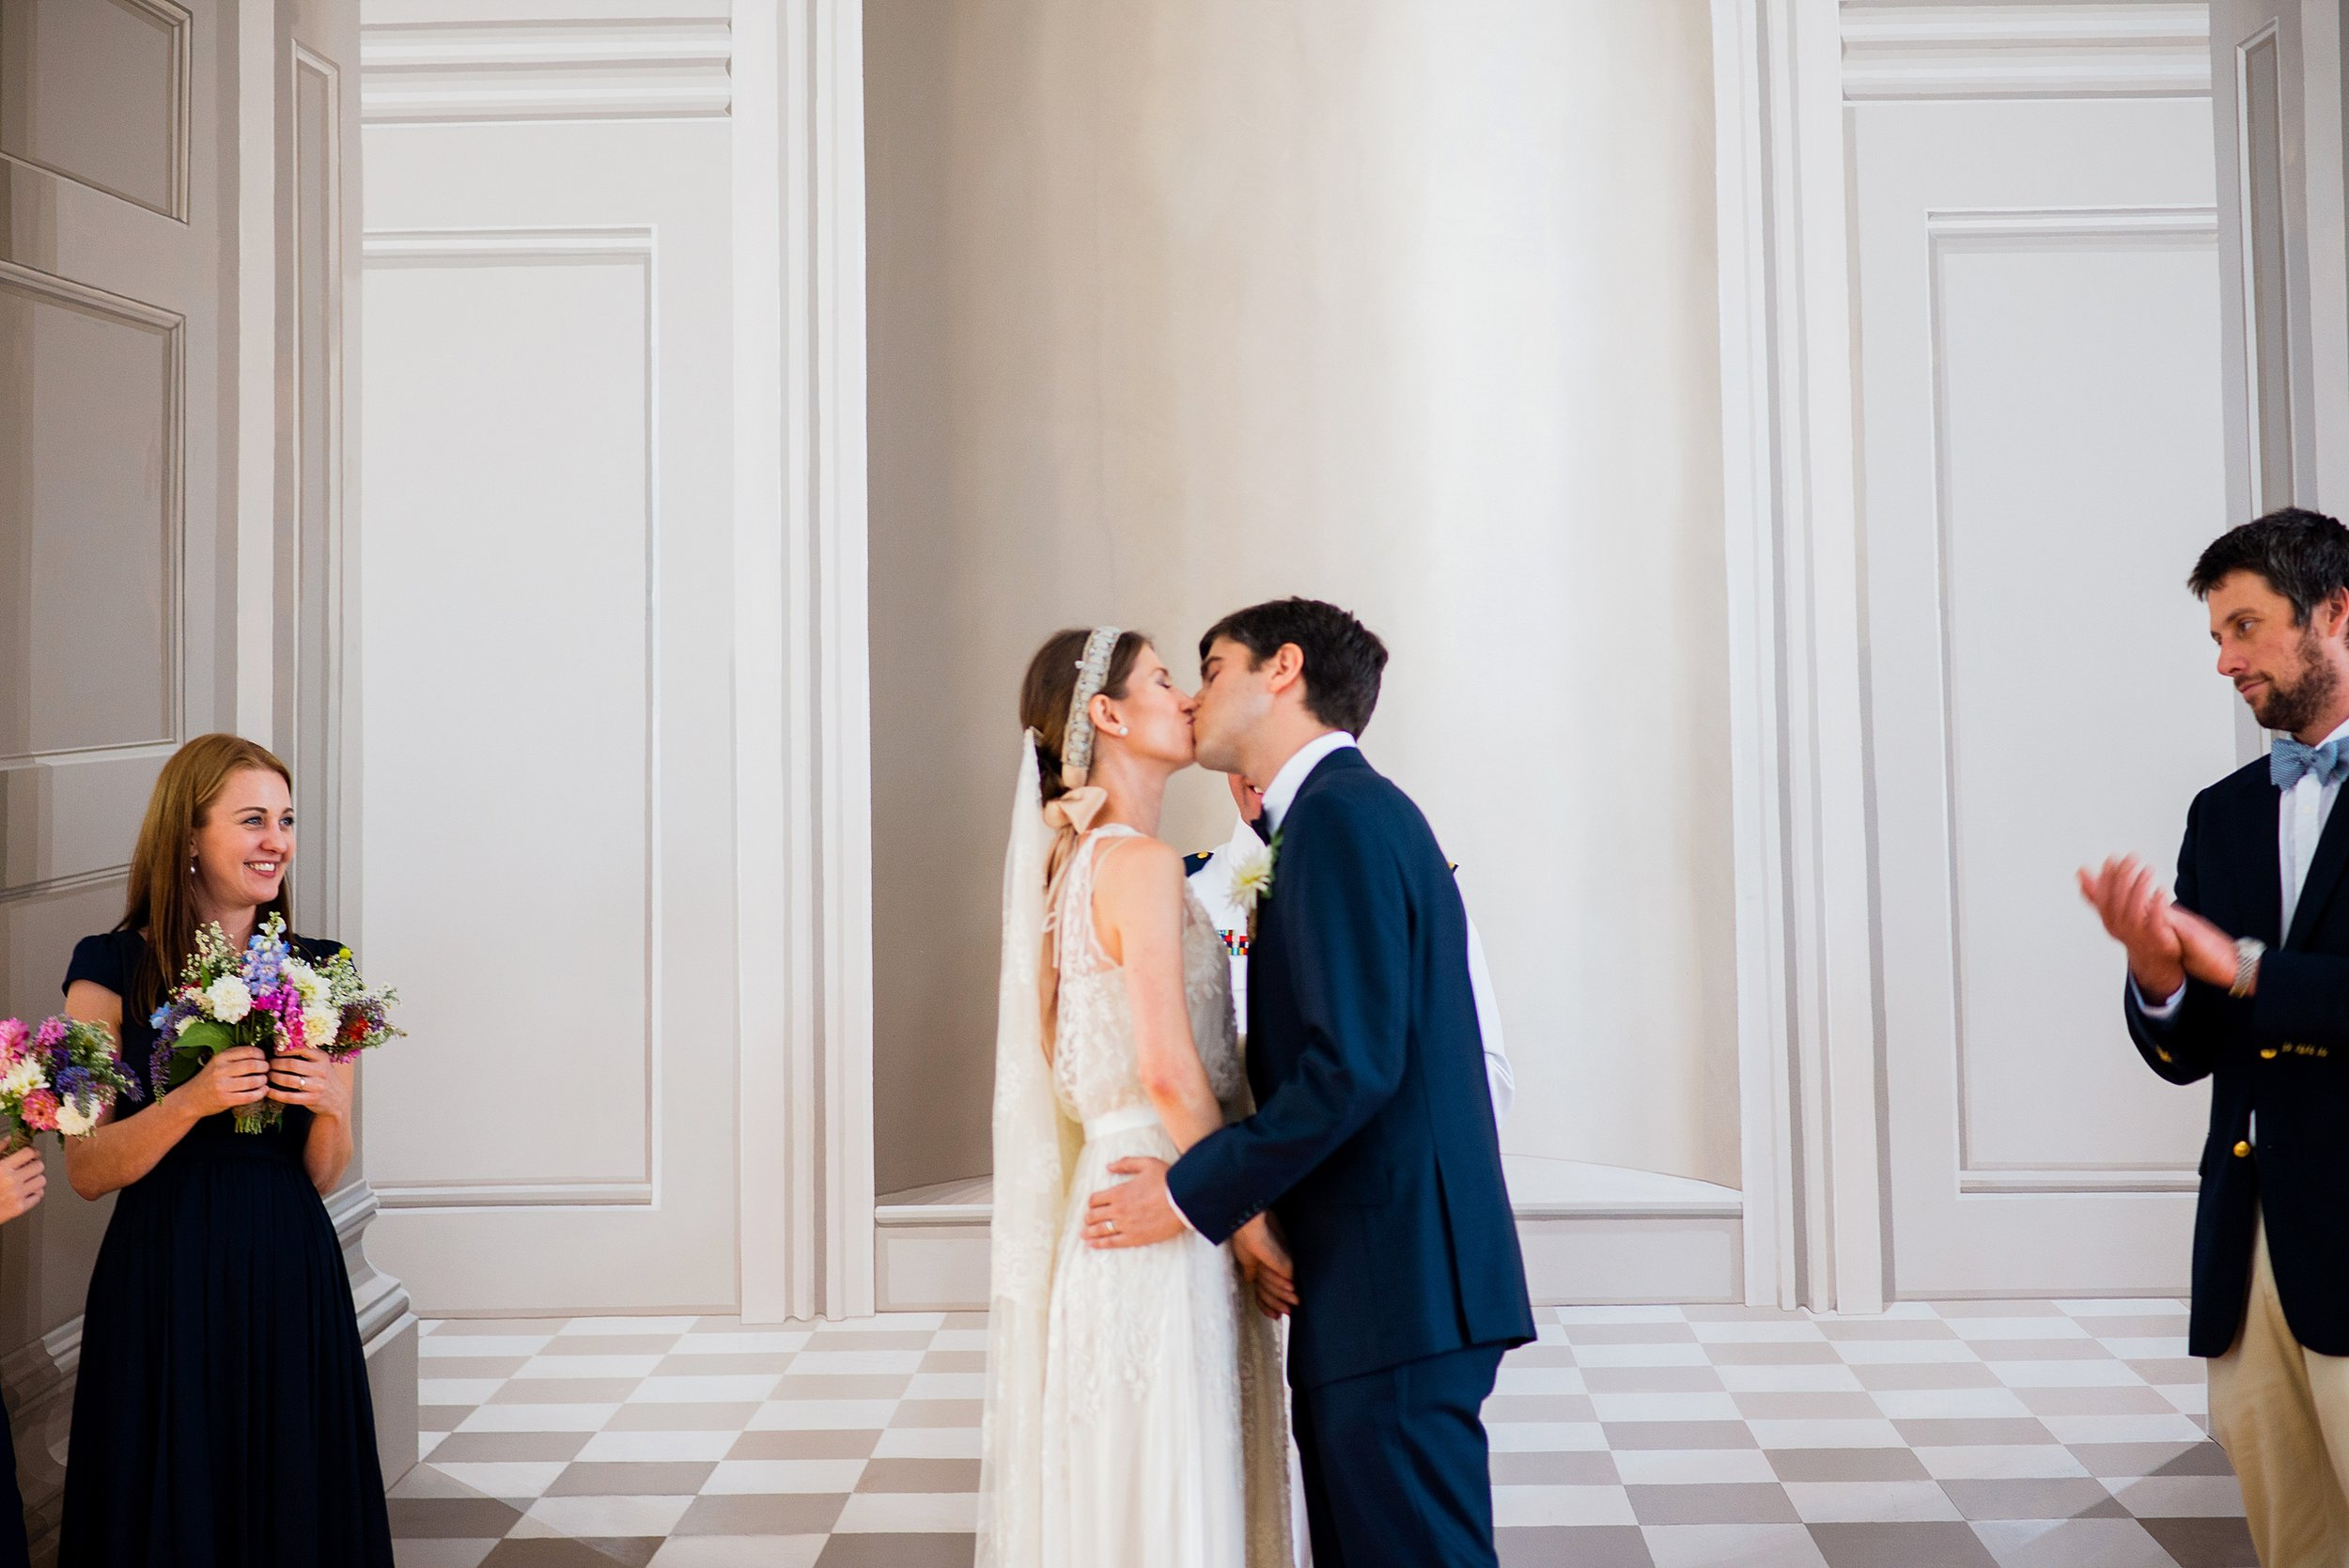 029 marthas vineyard wedding photographer todd danforth photography.jpg